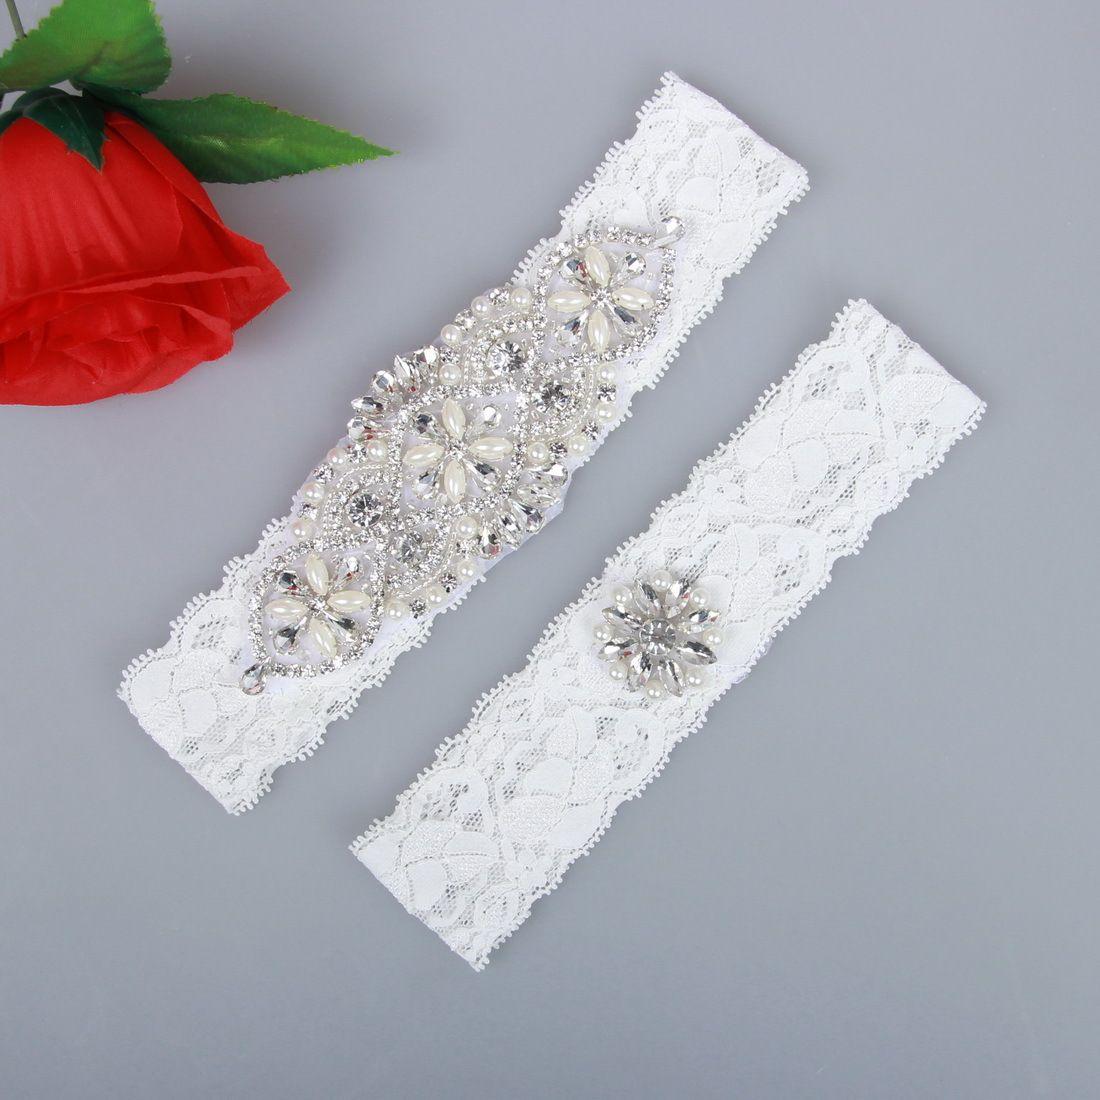 d6f2d2c8273 Wedding Garters For Bride Lace Bridal Garters White Ivory Bridal Wedding  Garter Set Belt Cheap Wedding Leg Garters In Stock Full Length Petticoats  Garter ...